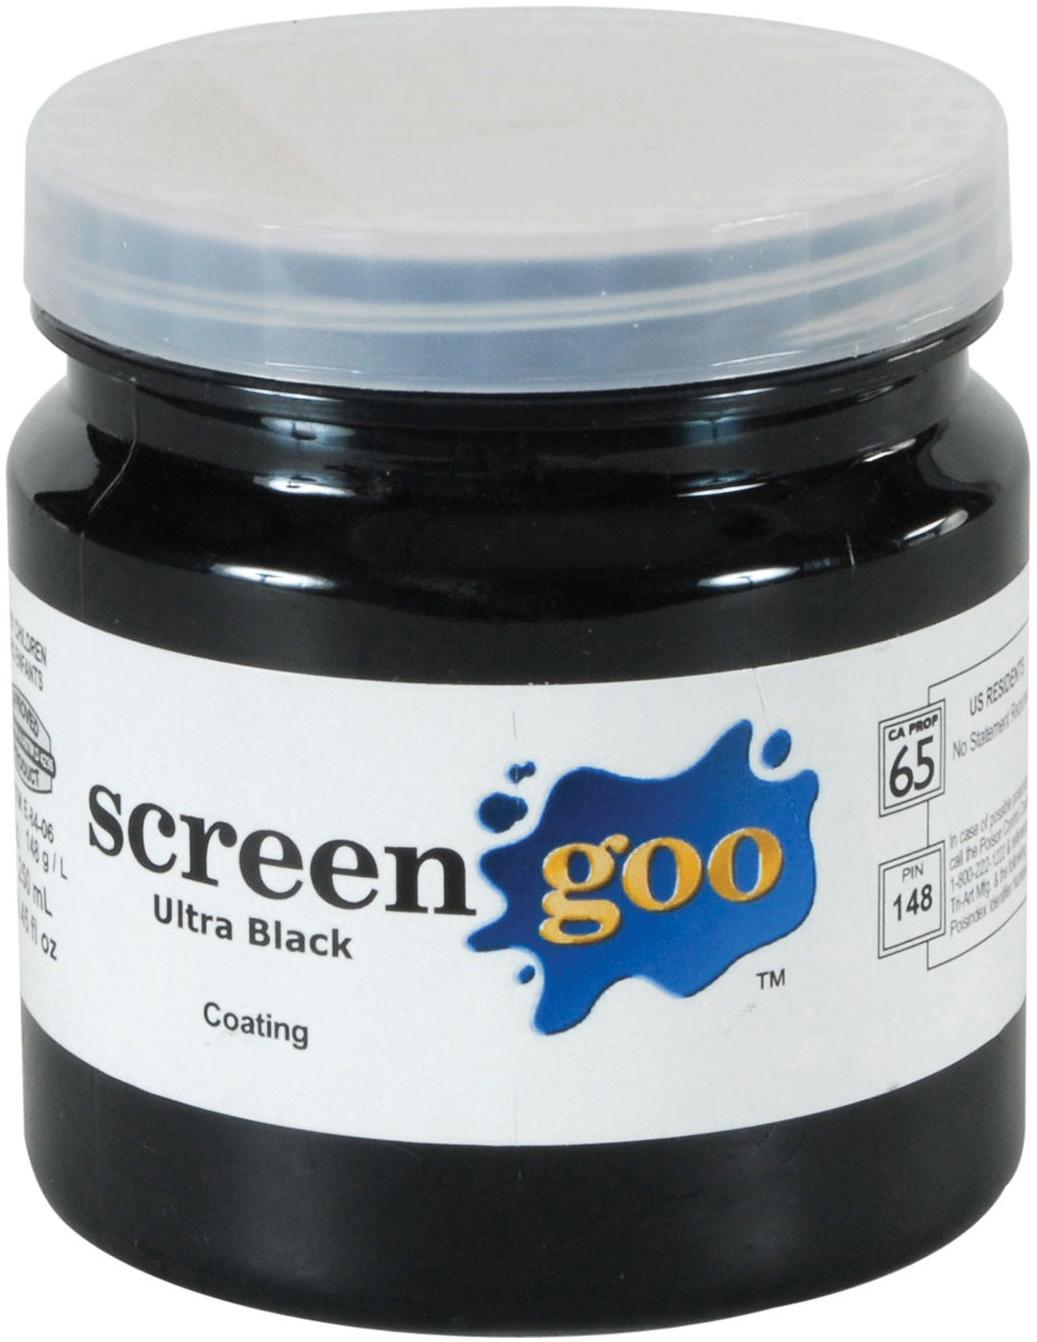 Screen Goo Ultra Black Projection Screen Paint 4604 250ml